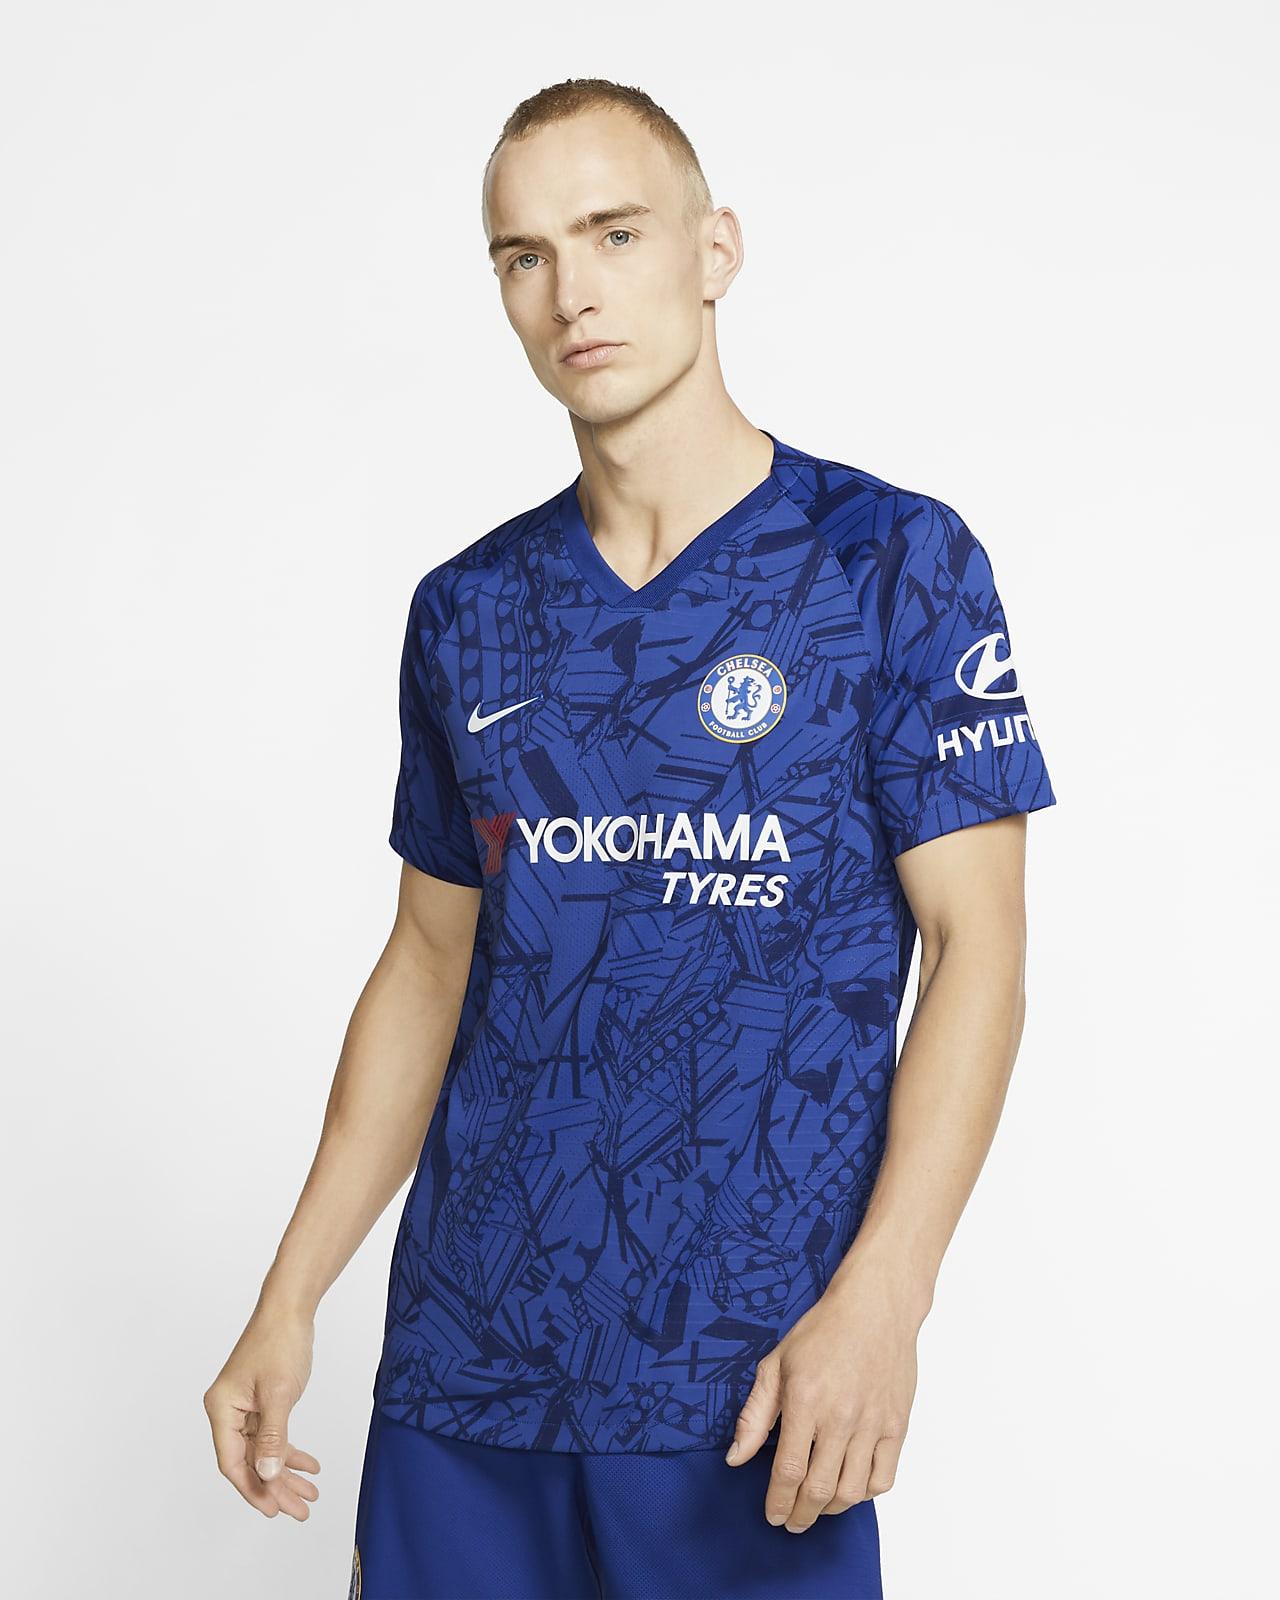 Maglia da calcio Chelsea FC 2019/20 Vapor Match Home - Uomo